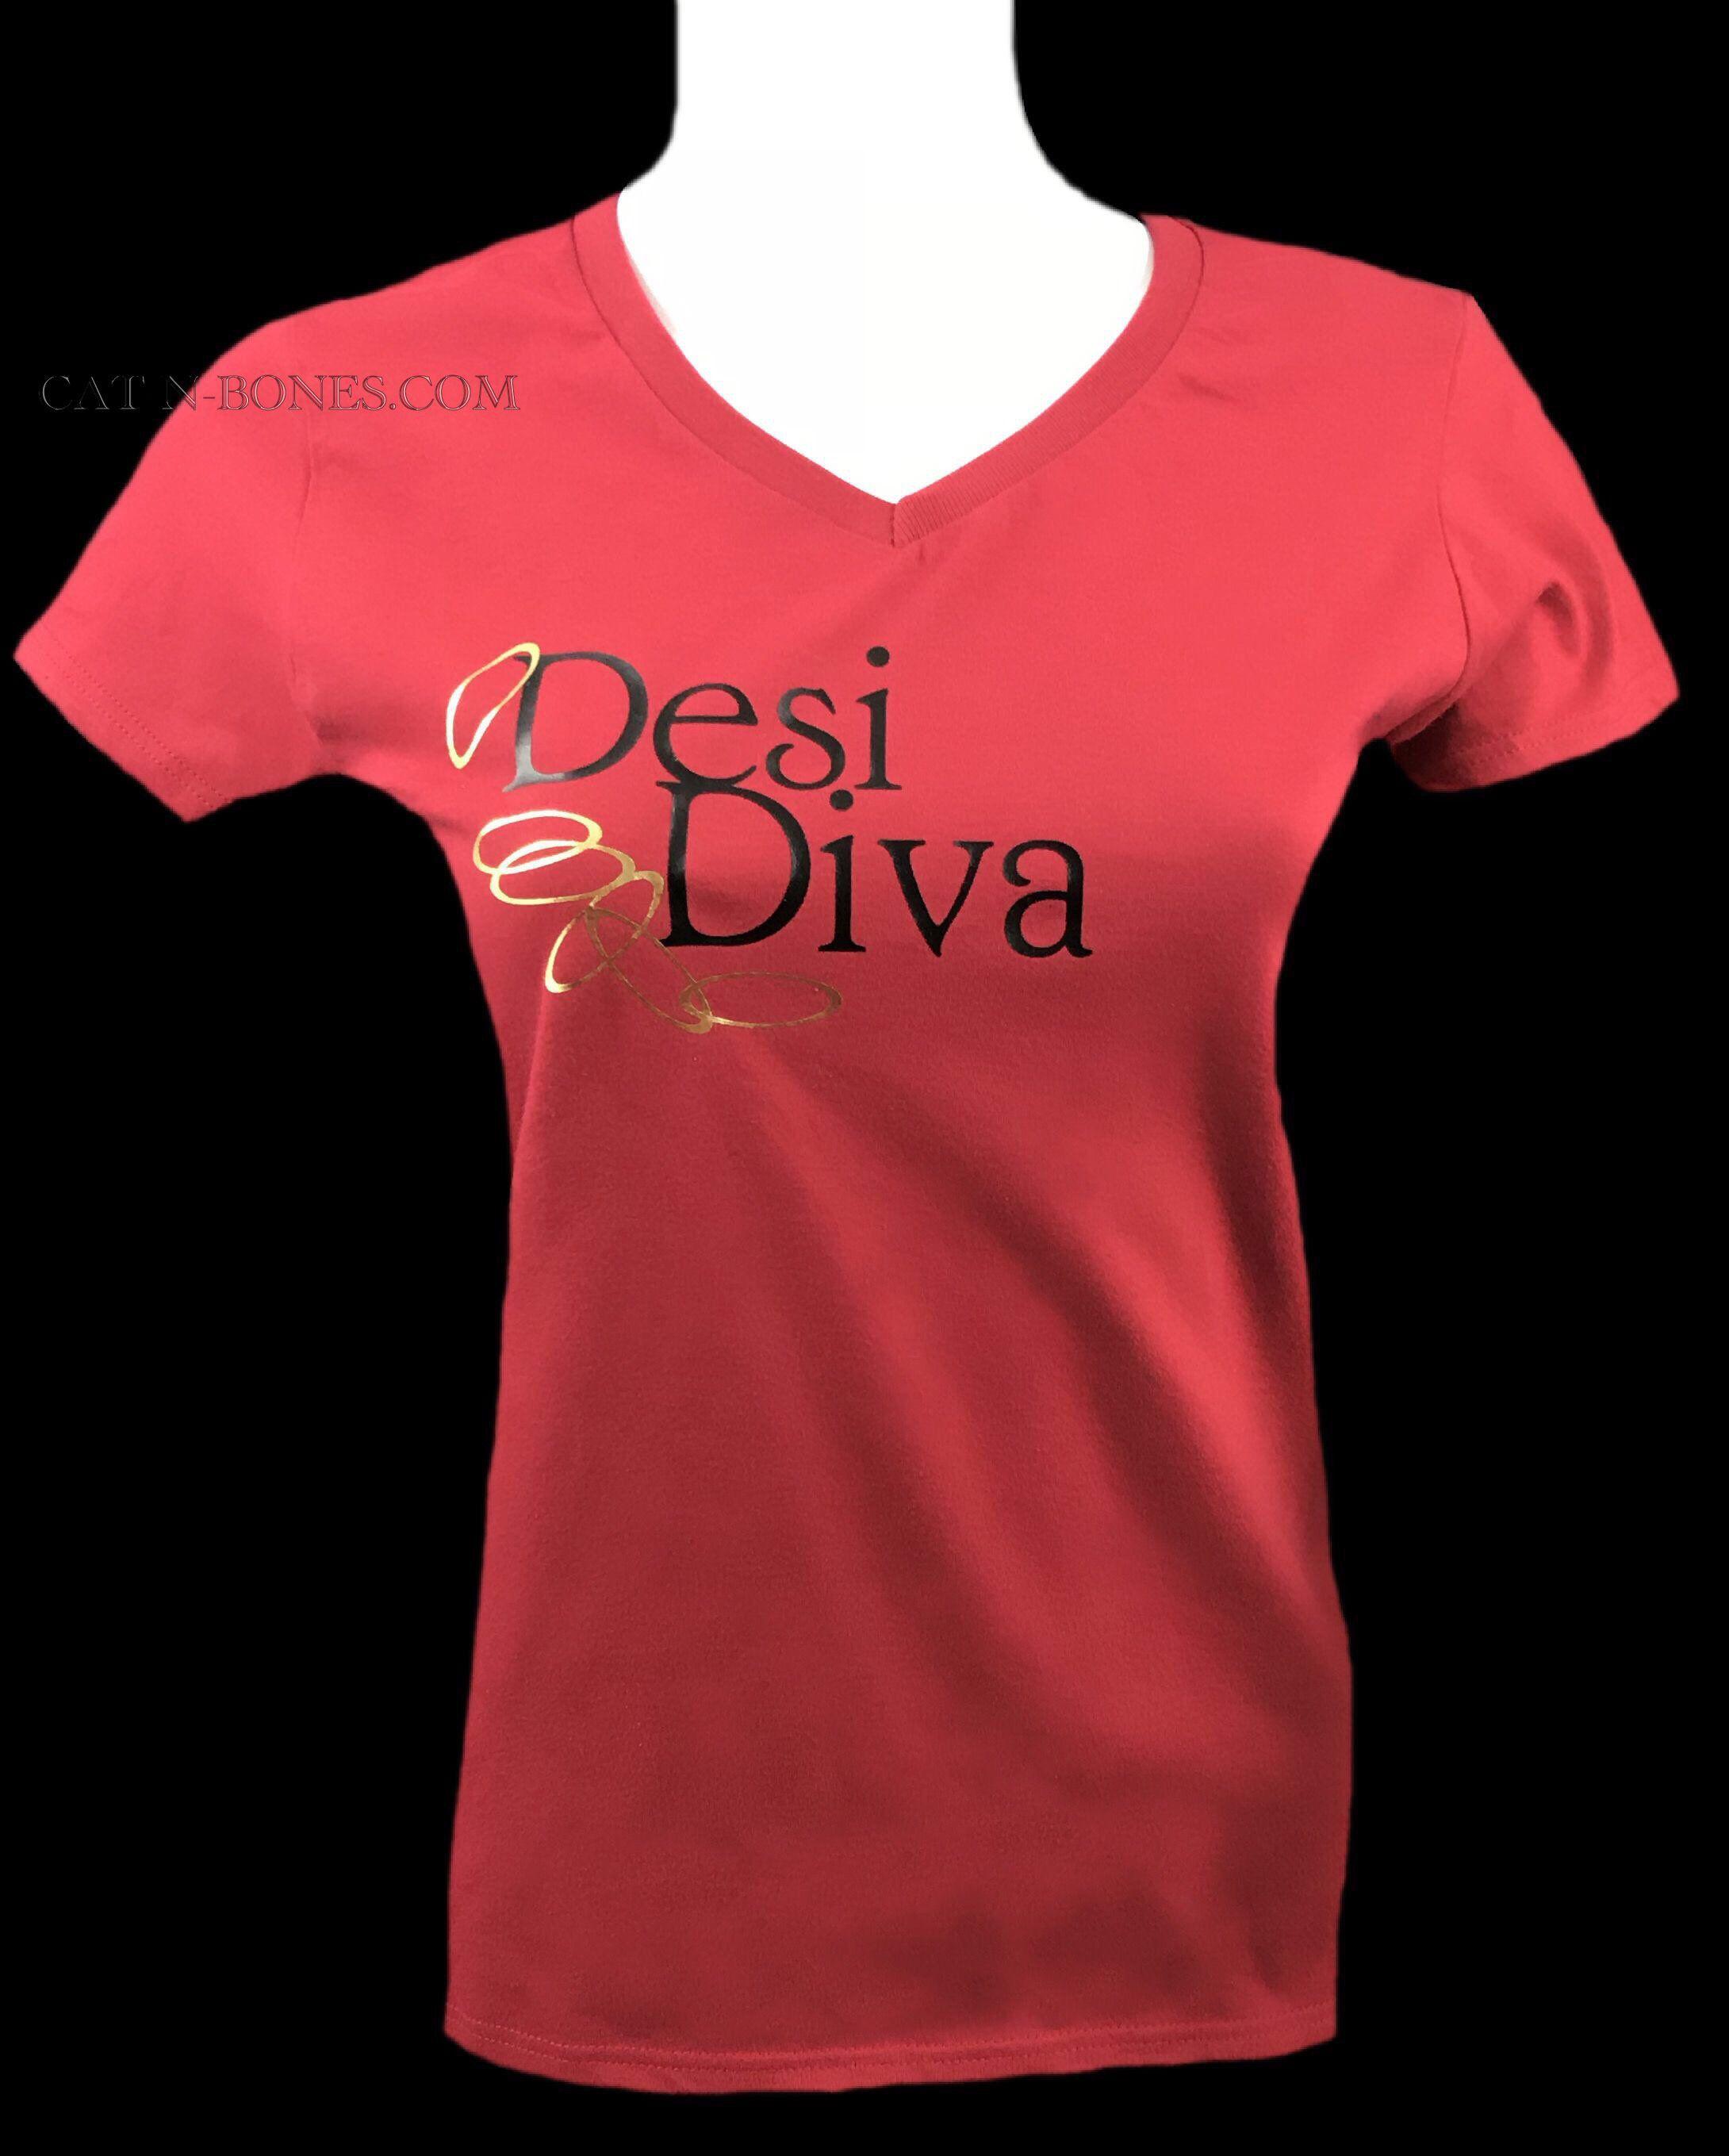 f3f46b945544 Desi Diva Shirt, Desi, Desi Shirt, Desi Girl Shirt, Desi Clothing, Funny  Desi Shirt, Desi Fashion, Birthday gift Desi Friend, Desi Clothes by  CatNBonesShop ...